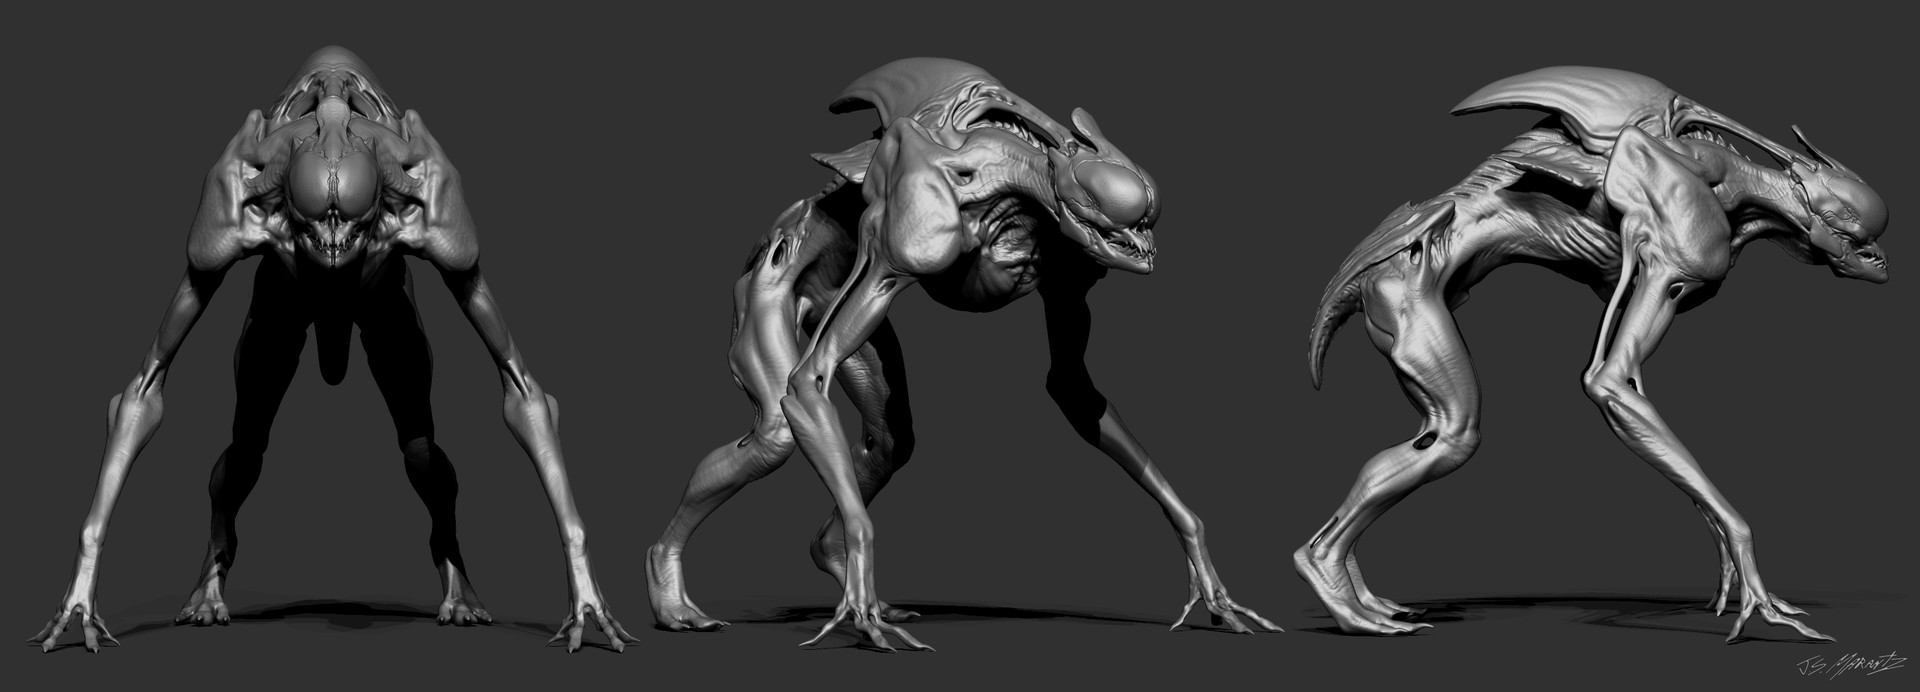 Jerx marantz creature ortho 1